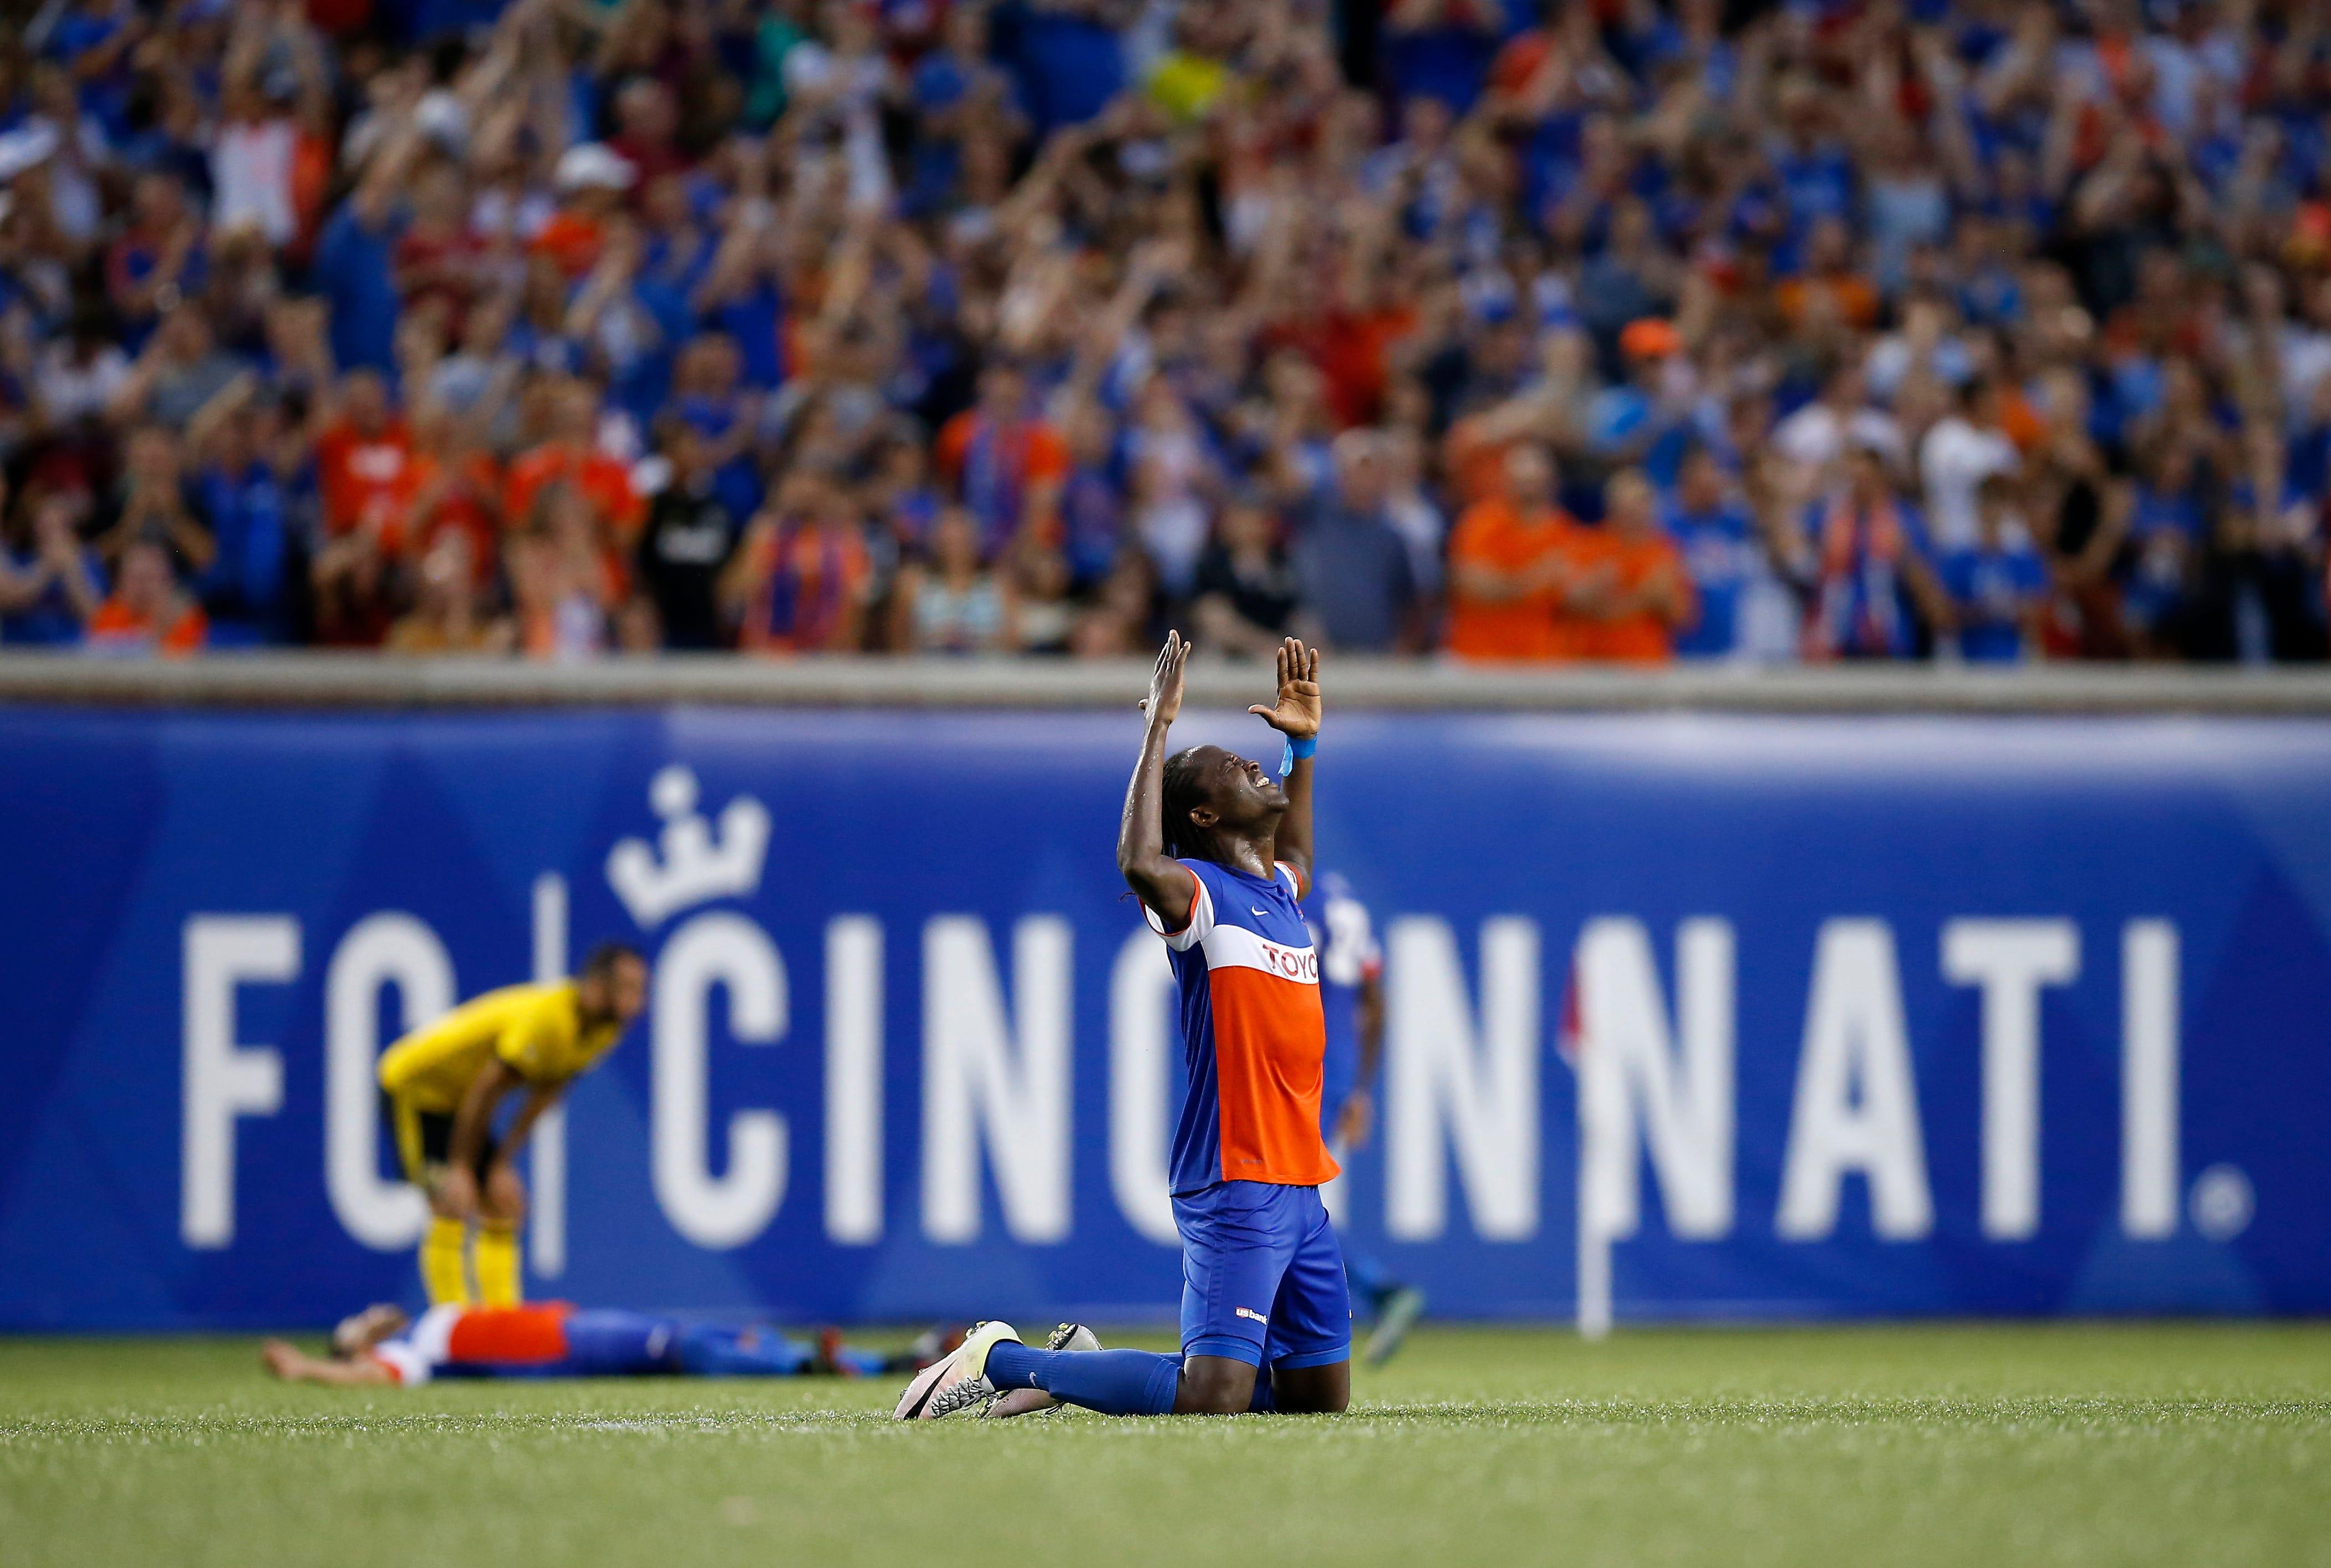 Miracle on grass: FC Cincinnati downs Columbus Crew SC